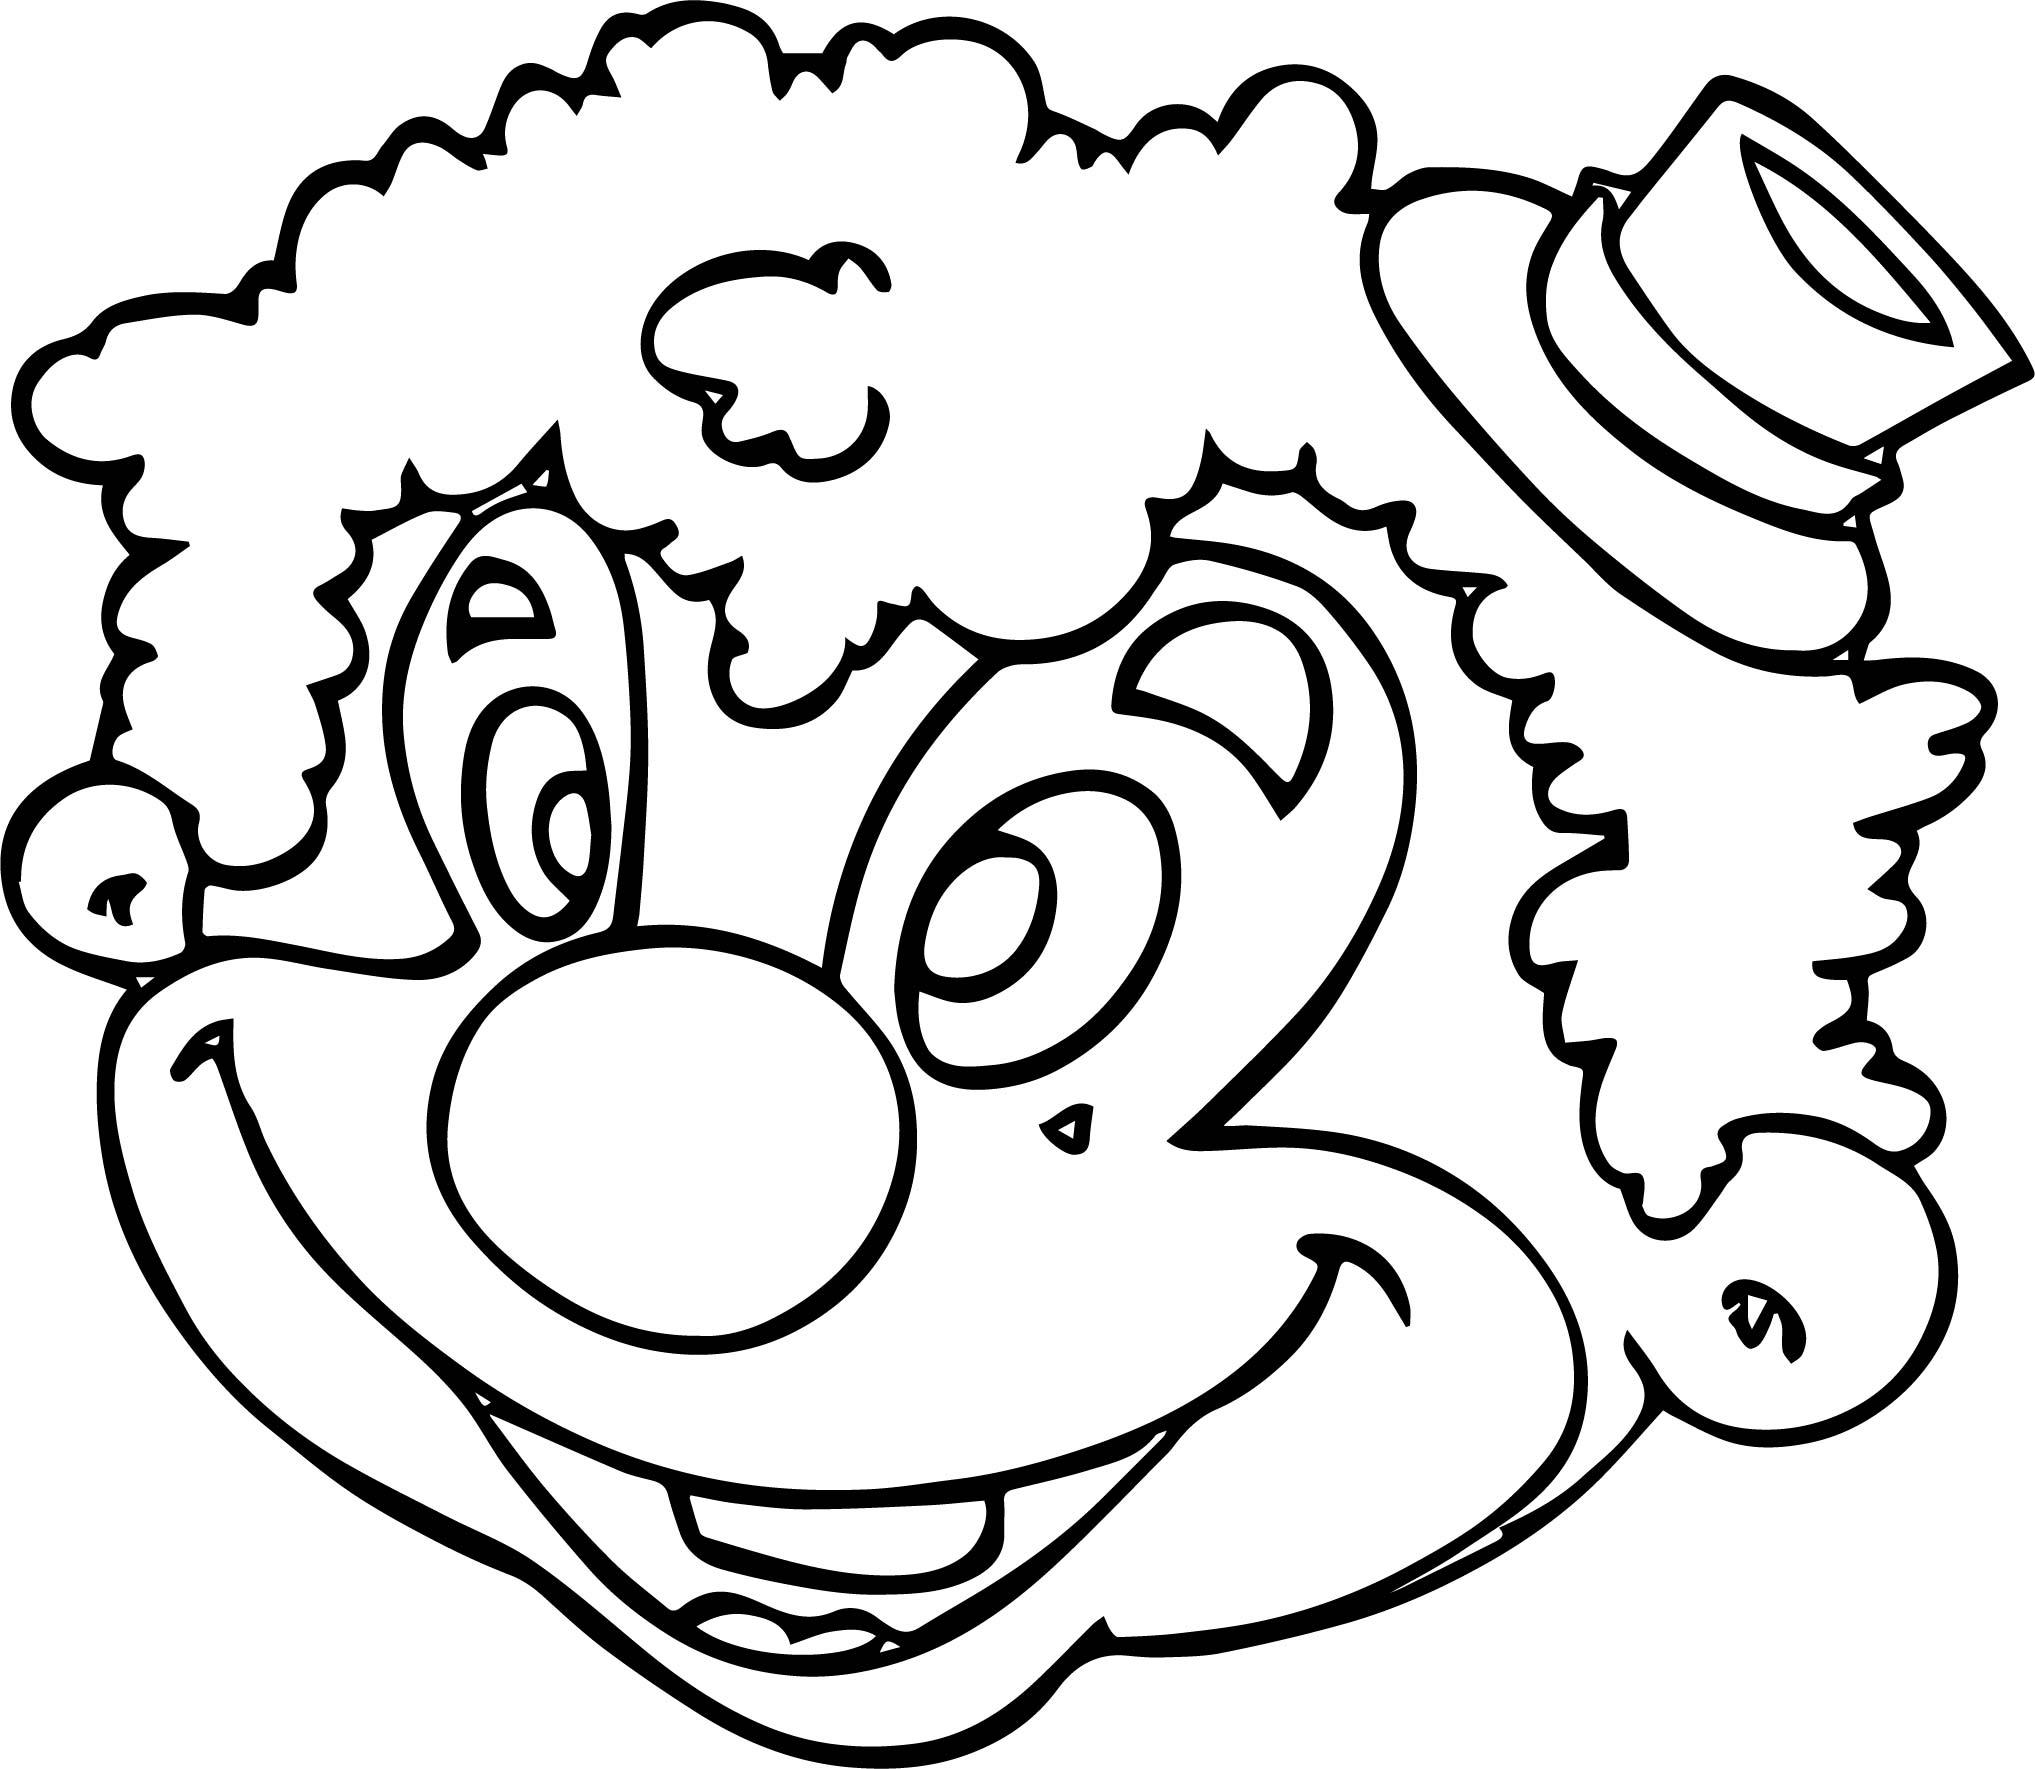 Bild Cartoon Grafik Illustration Coloring Page